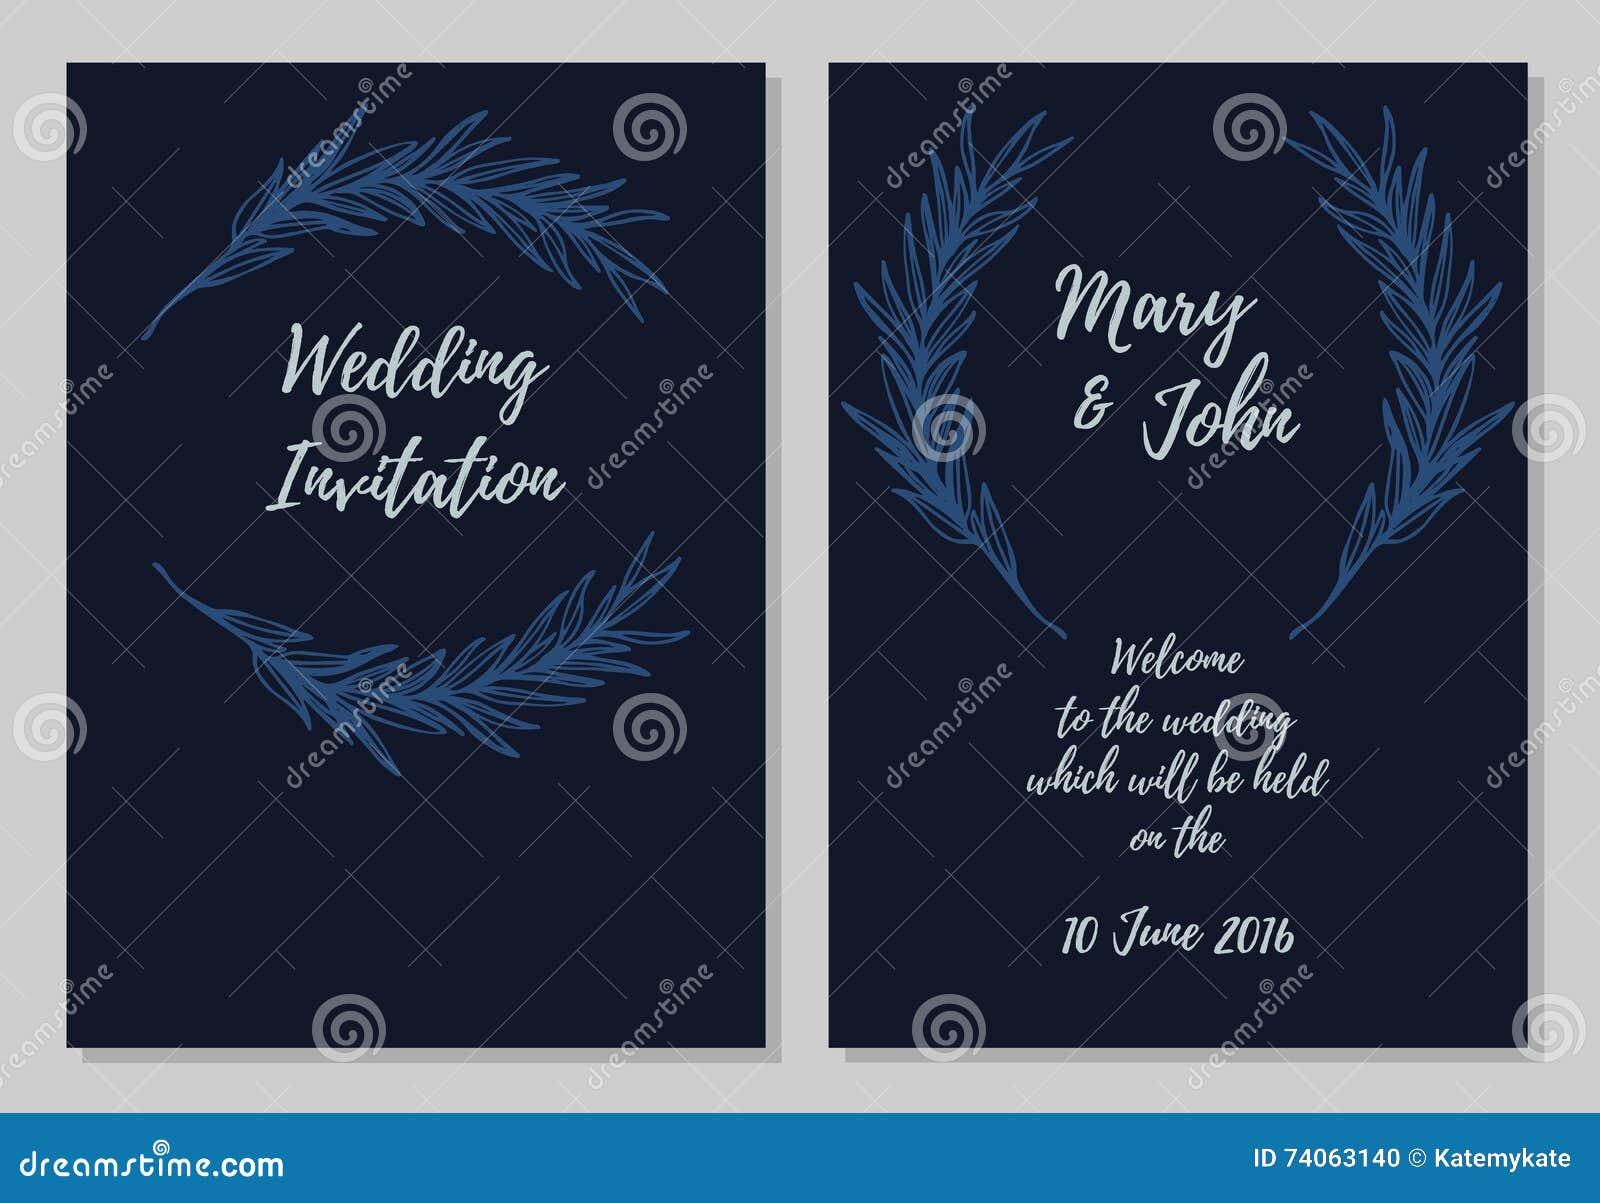 Hand Drawn Vector Illustration - Wedding Invitation Card Stock ...